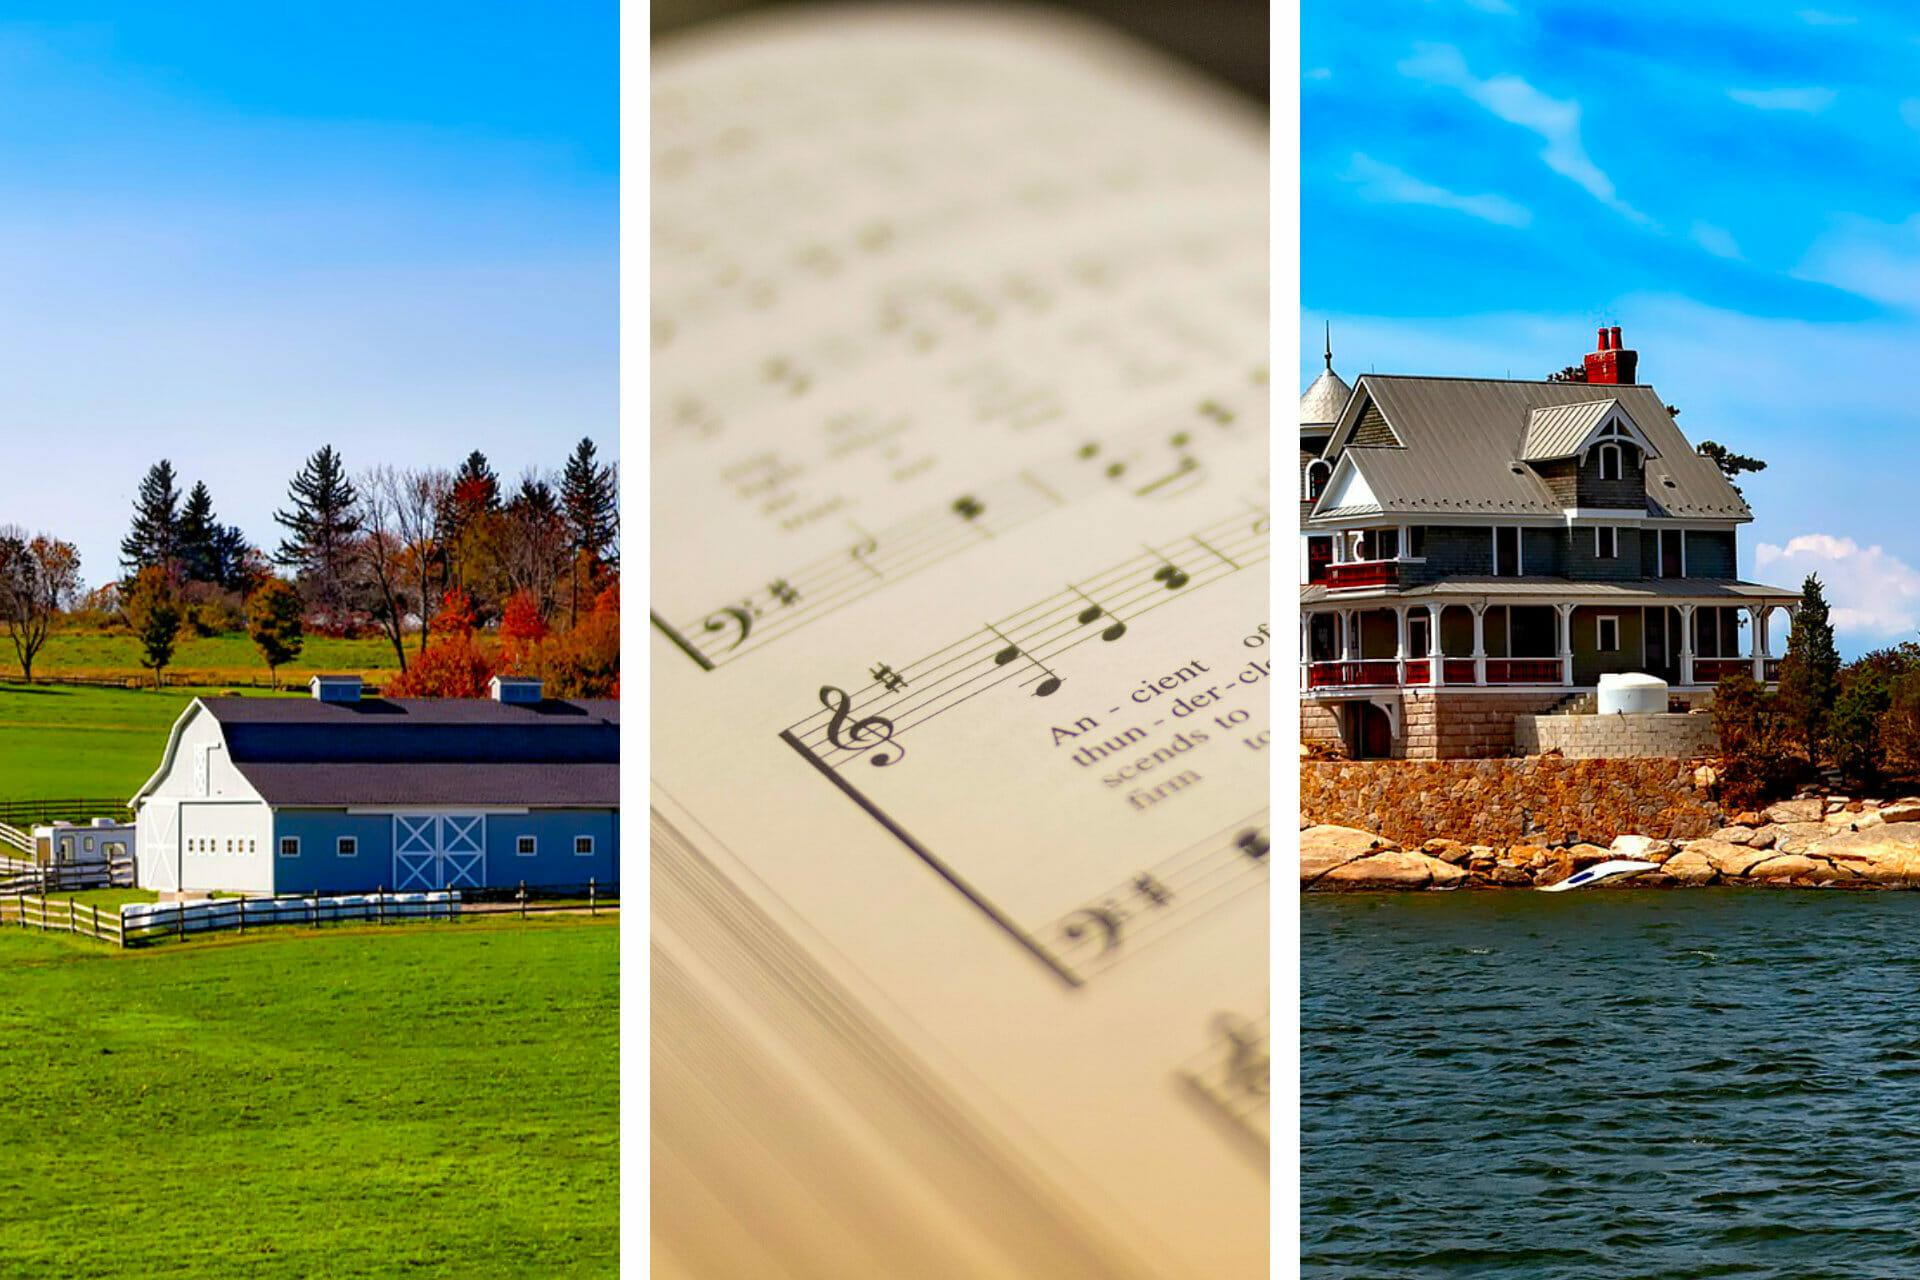 16+ Songs about Connecticut to Make You Smile via @allamericanatlas